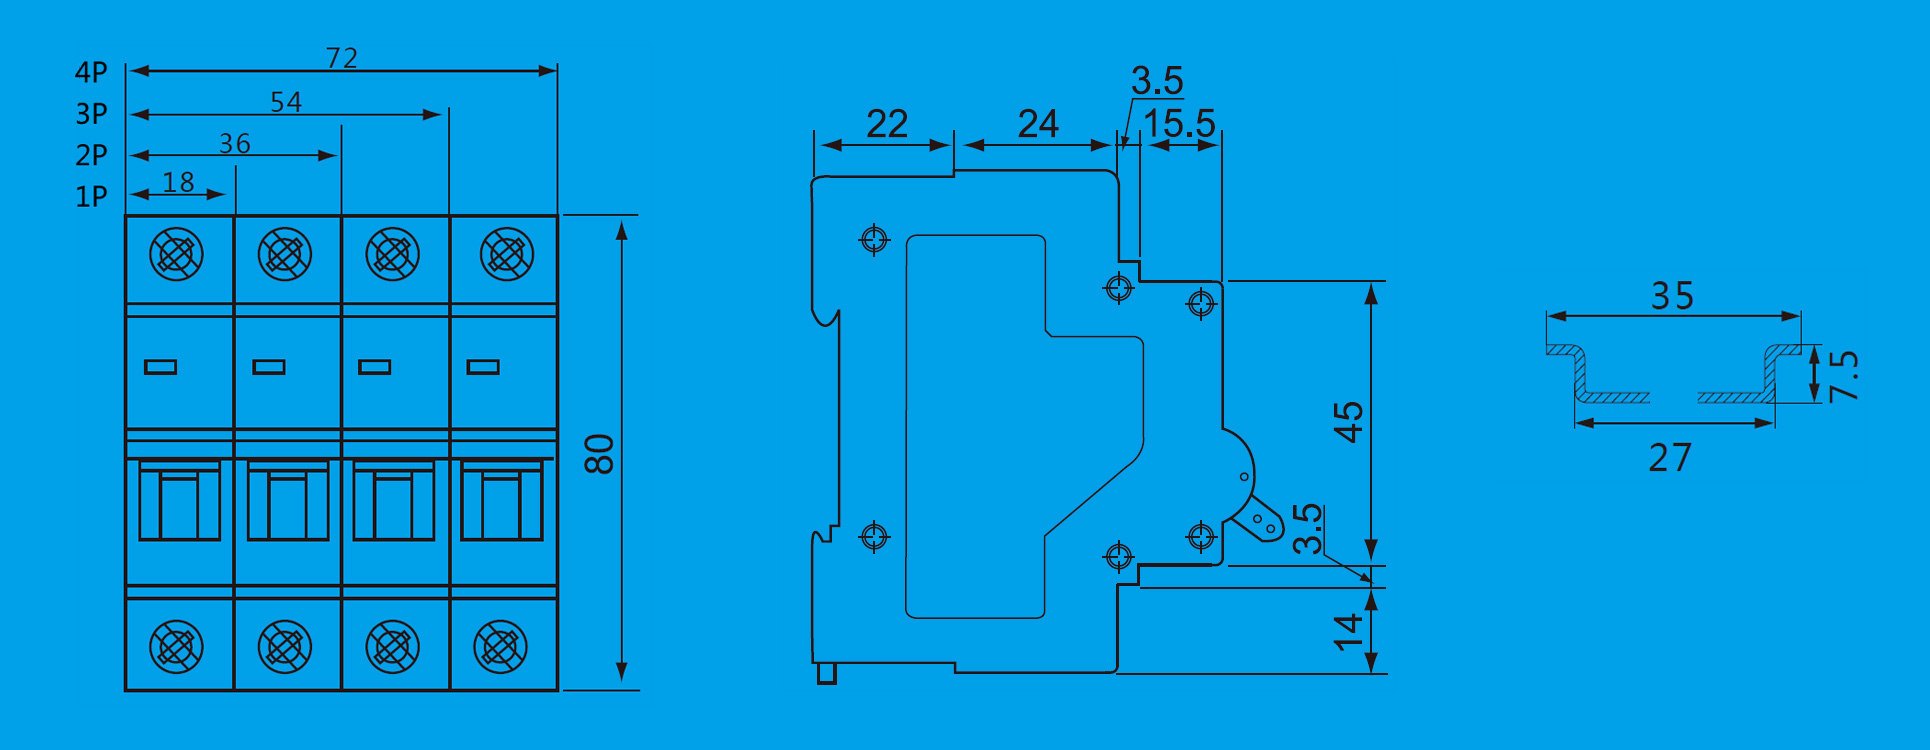 12 Volt Dc Circuit Breaker 60 50 40 30 20 10 Amp Taixi Electric Breakers Keywords Breaker12v Breakerdc